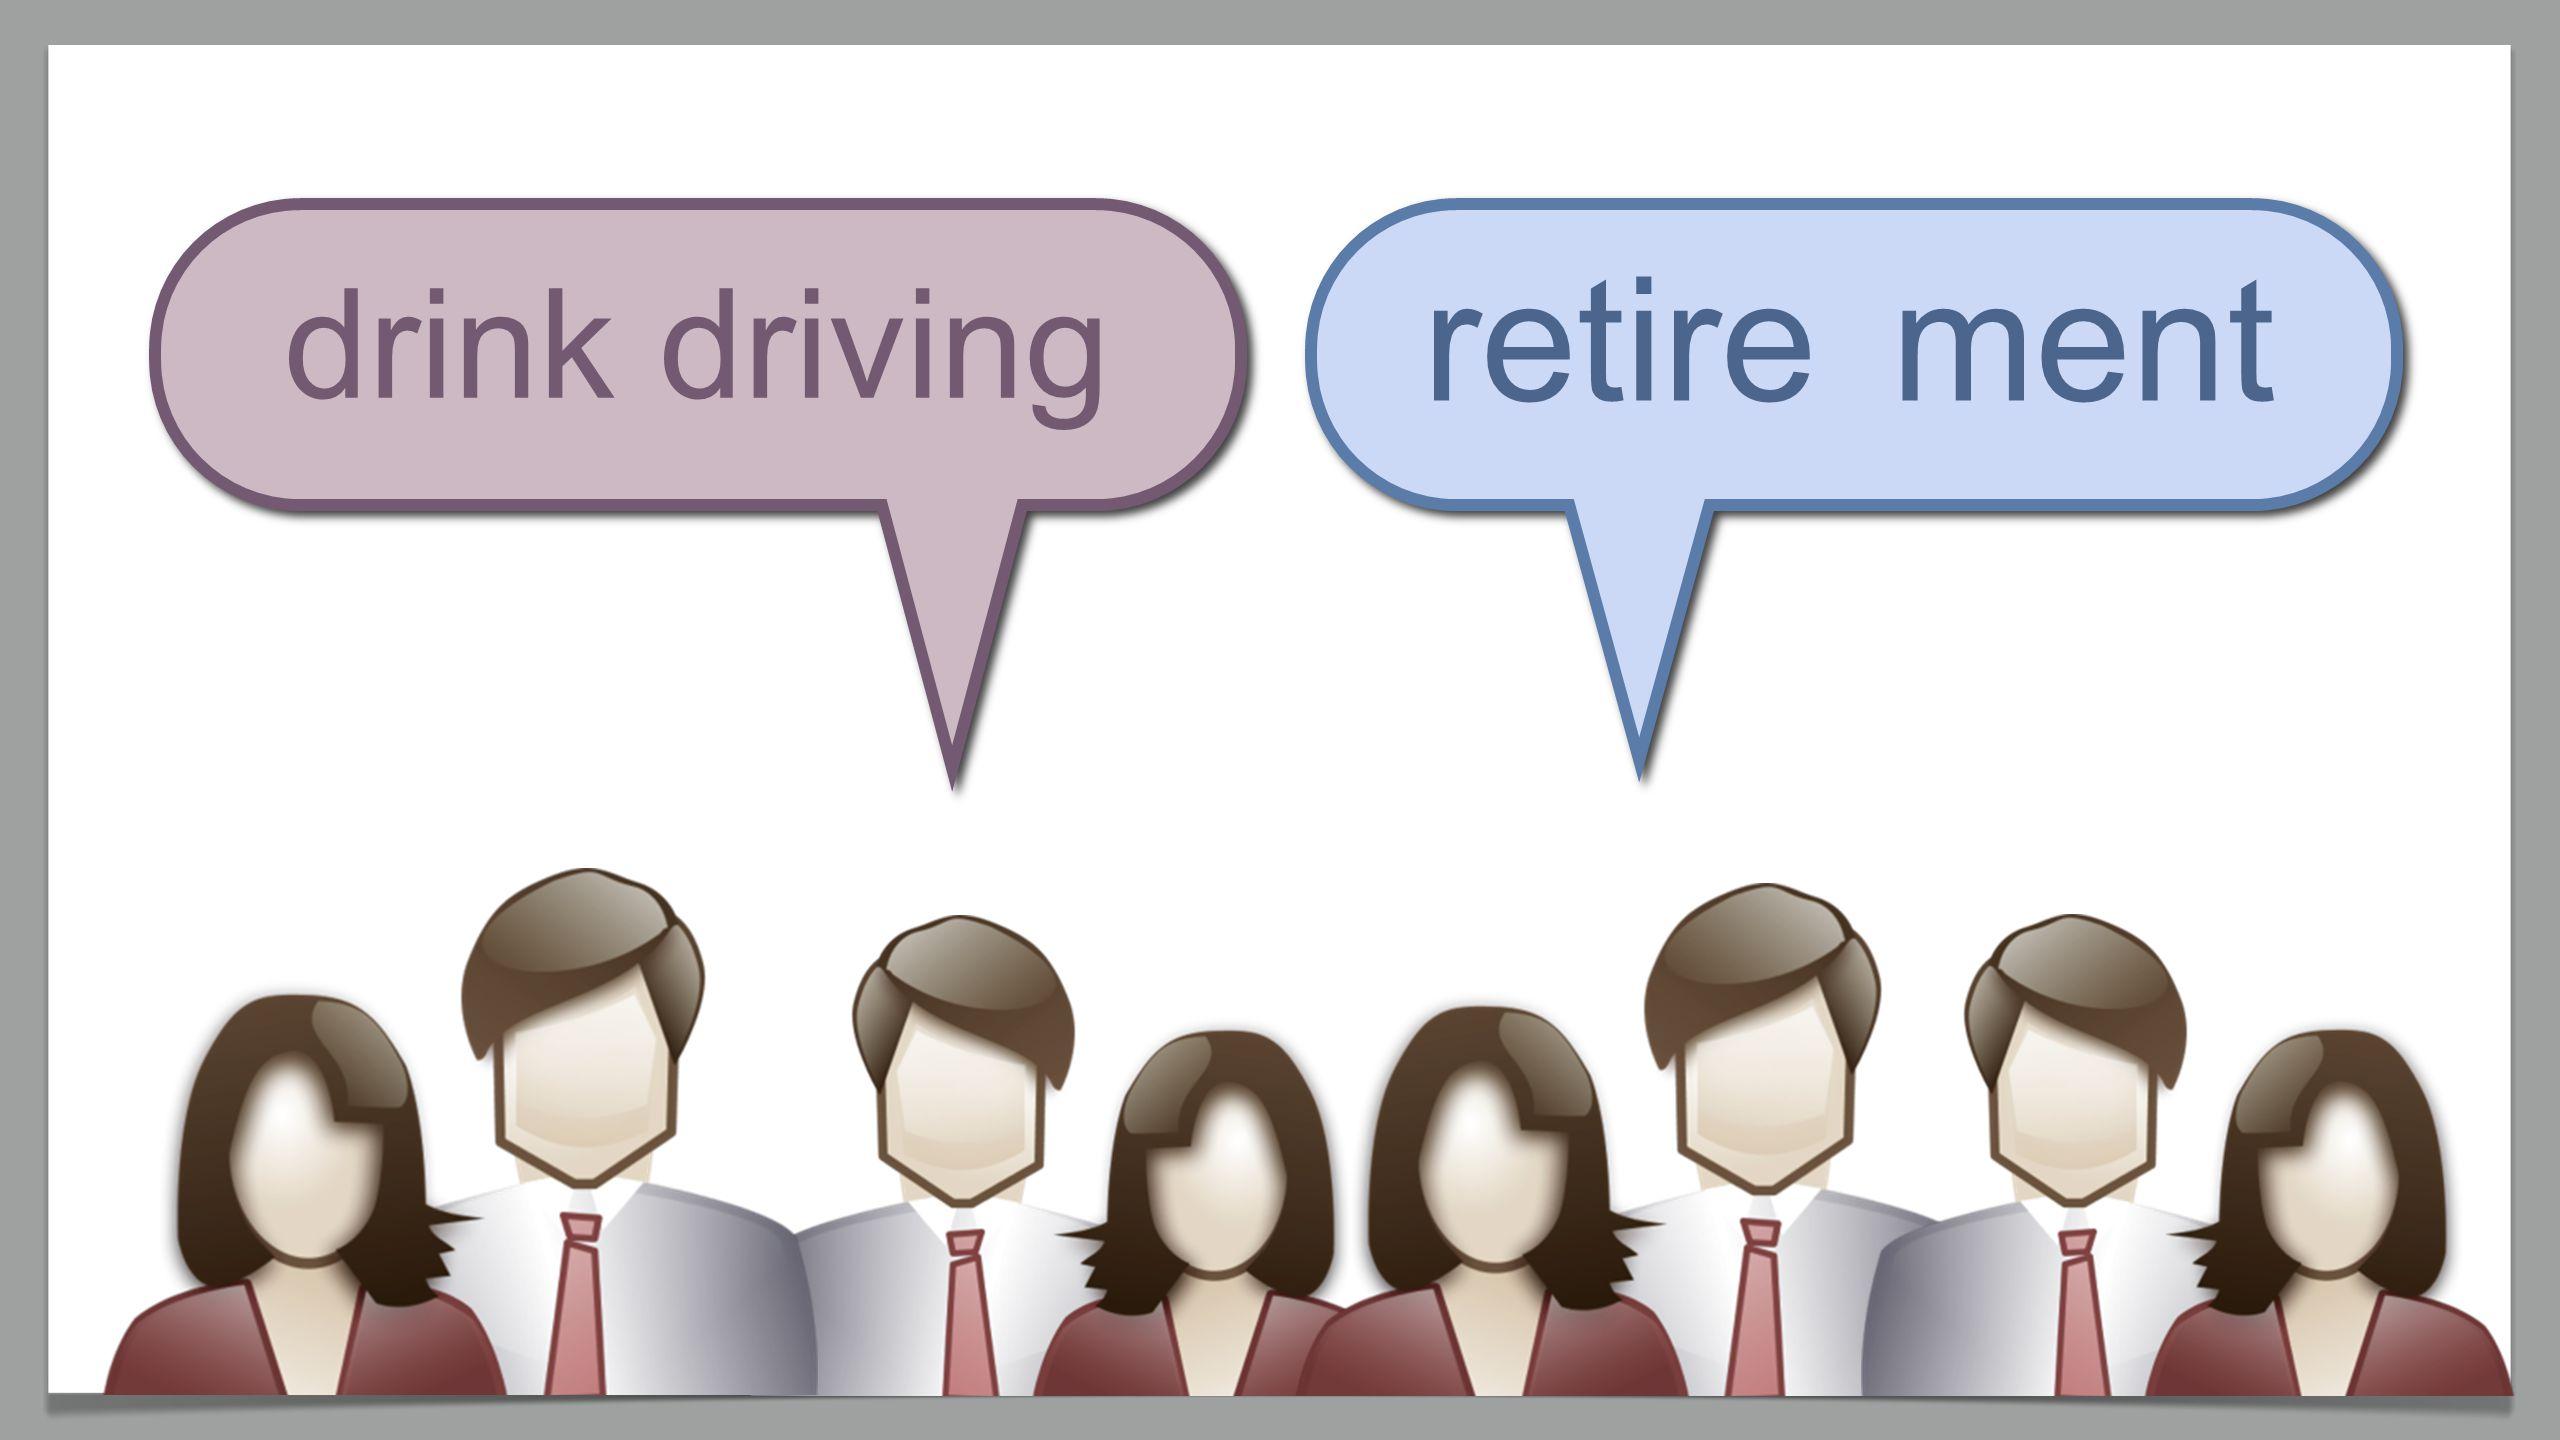 retirement drink driving